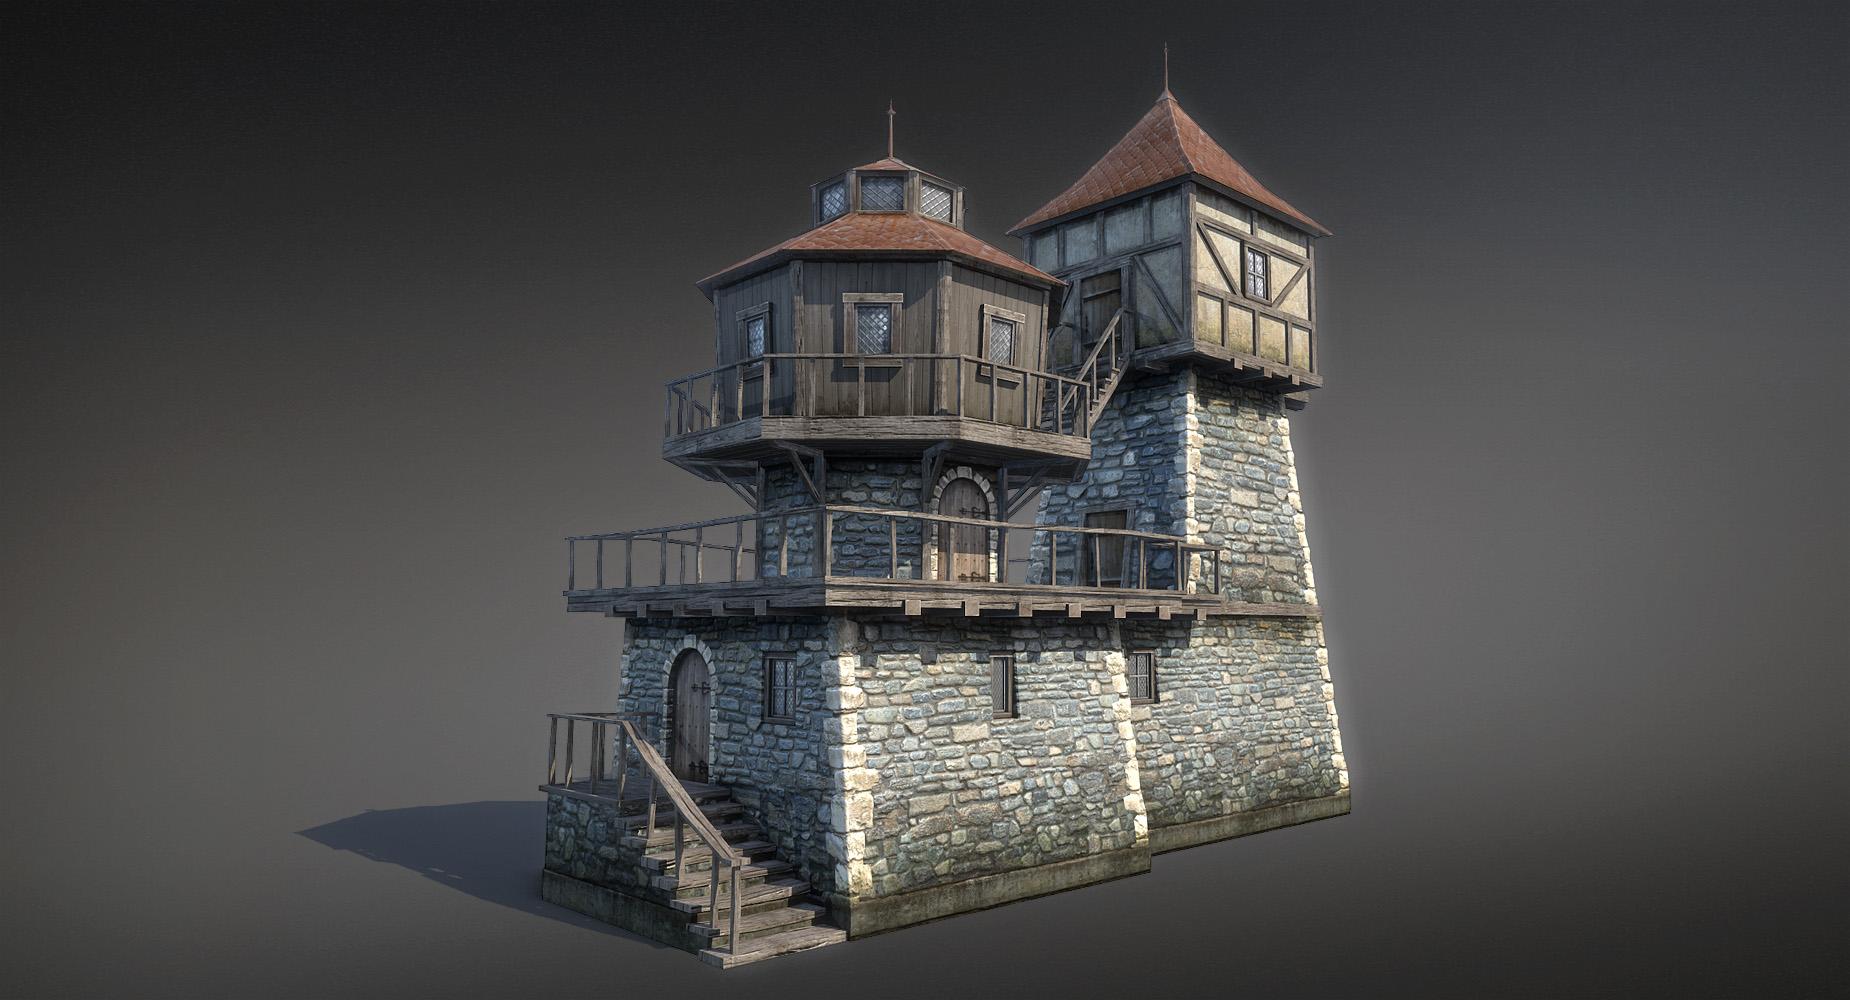 Fantasy House 04 3d Game Low Poly By Sergey Ryzhkov On Deviantart